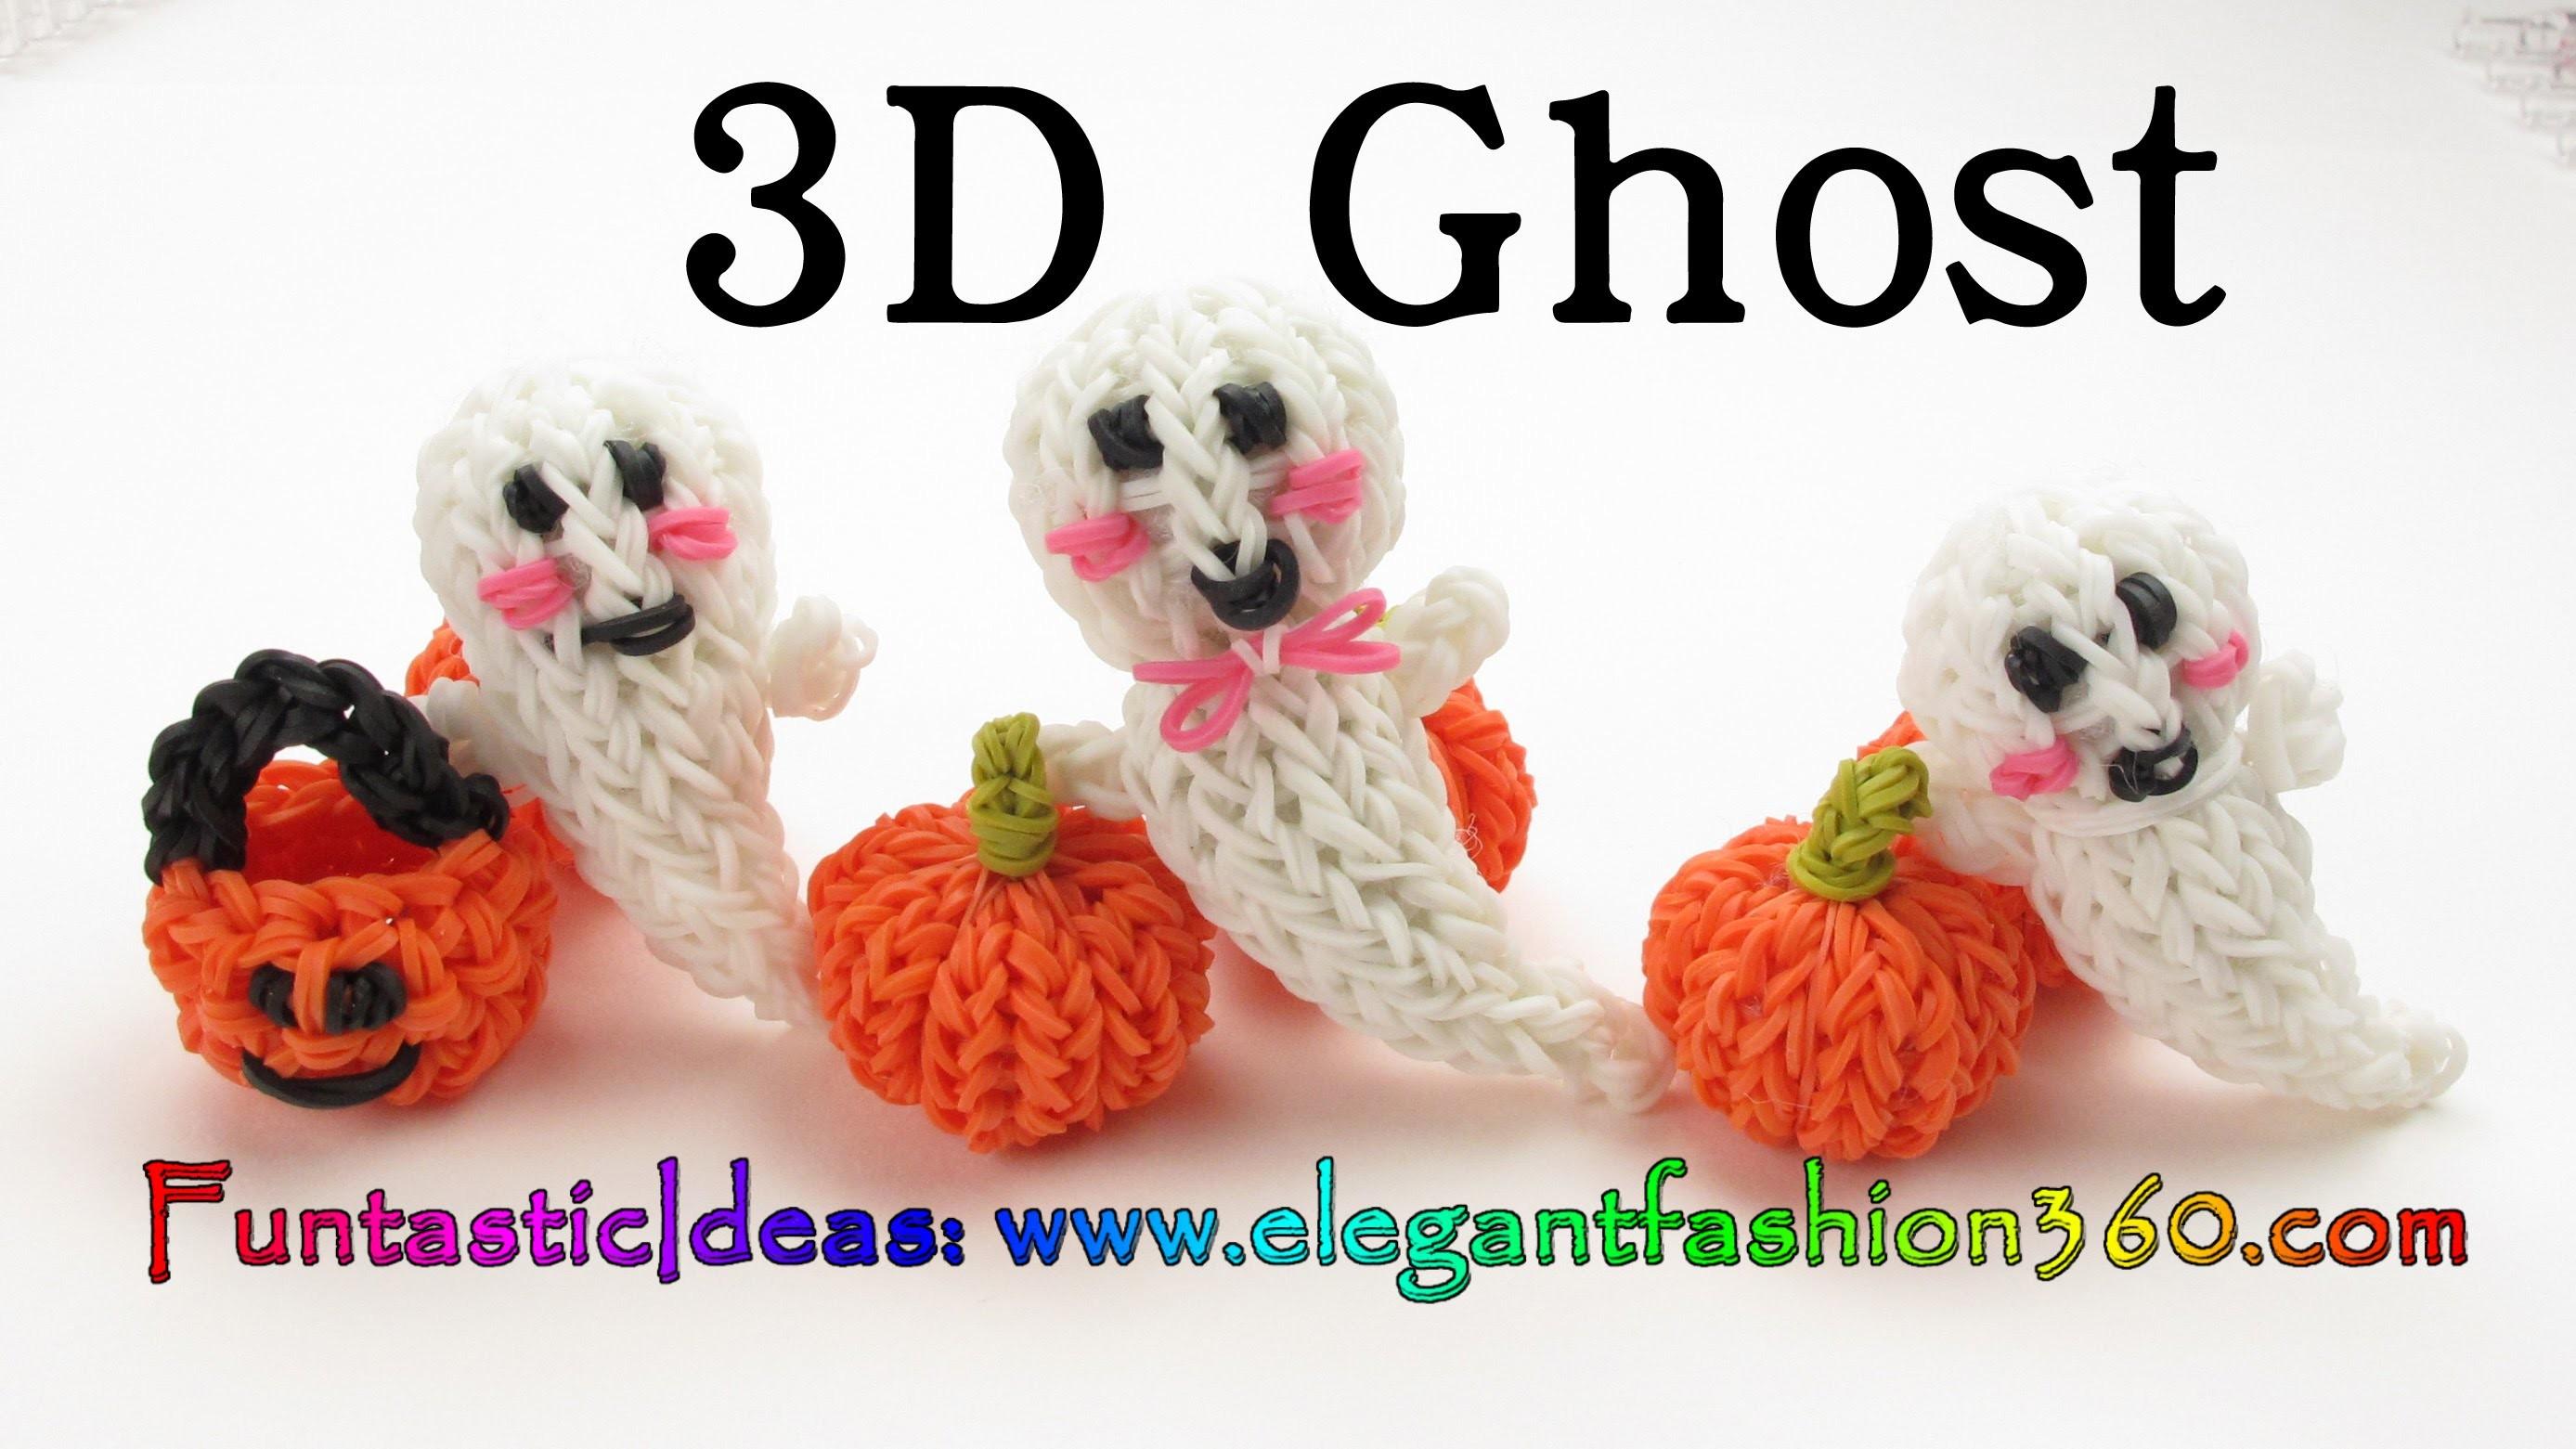 Rainbow Loom 3D Ghost.Casper Charm - Halloween-How to loom bands tutorial